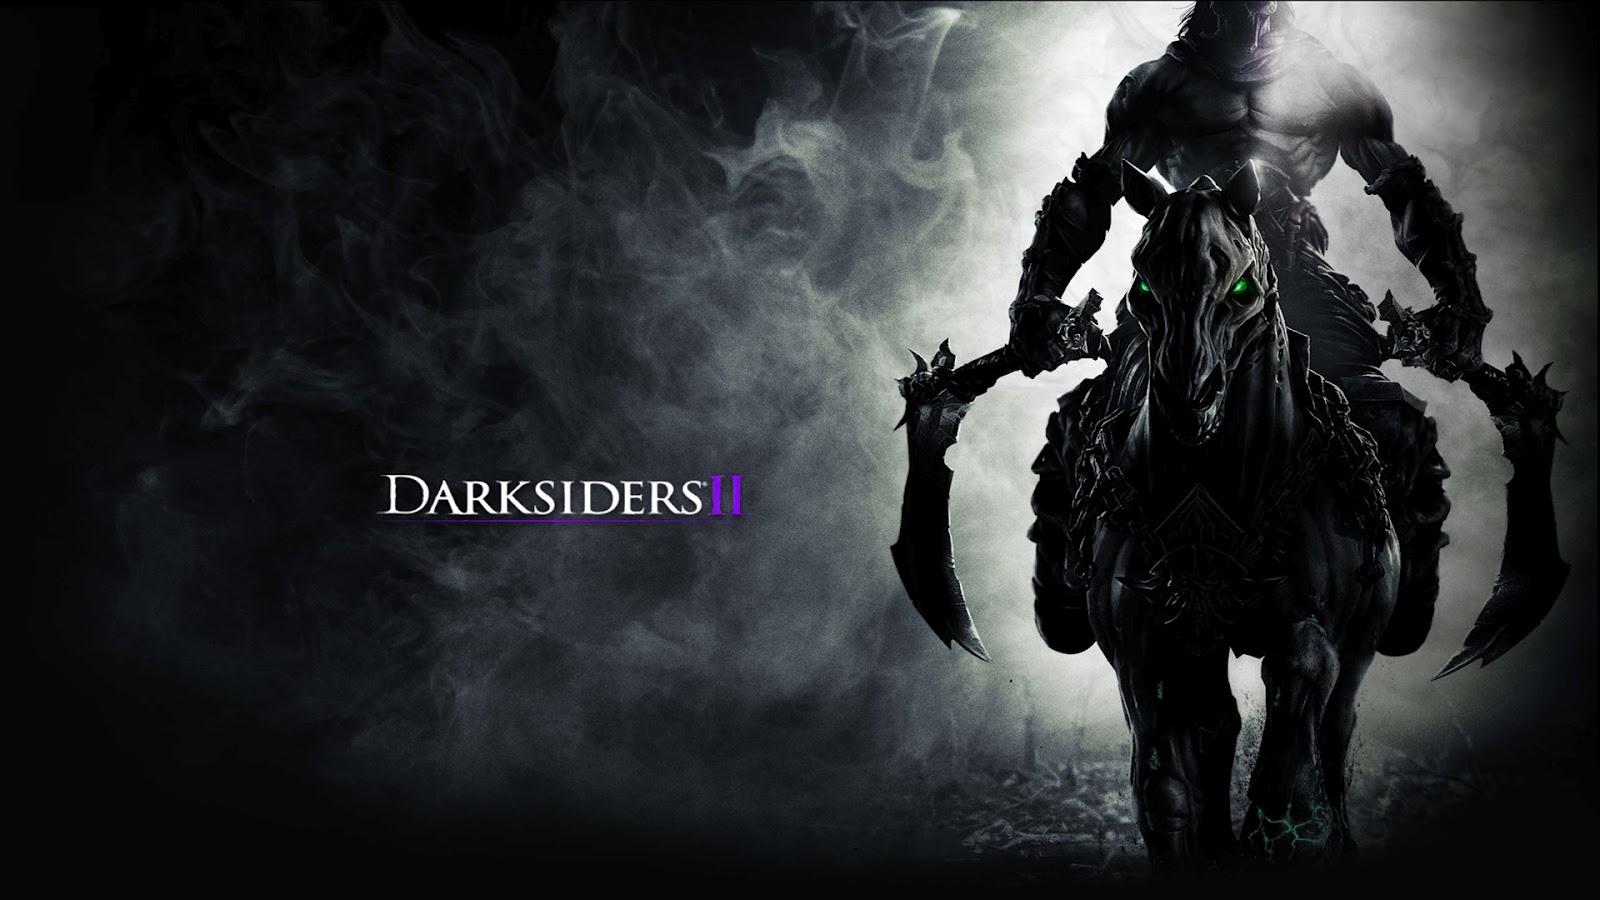 Popular   Wallpaper Horse Epic - darksiders_2___death_rides%20PiCsHoliC  Image_604334.jpg